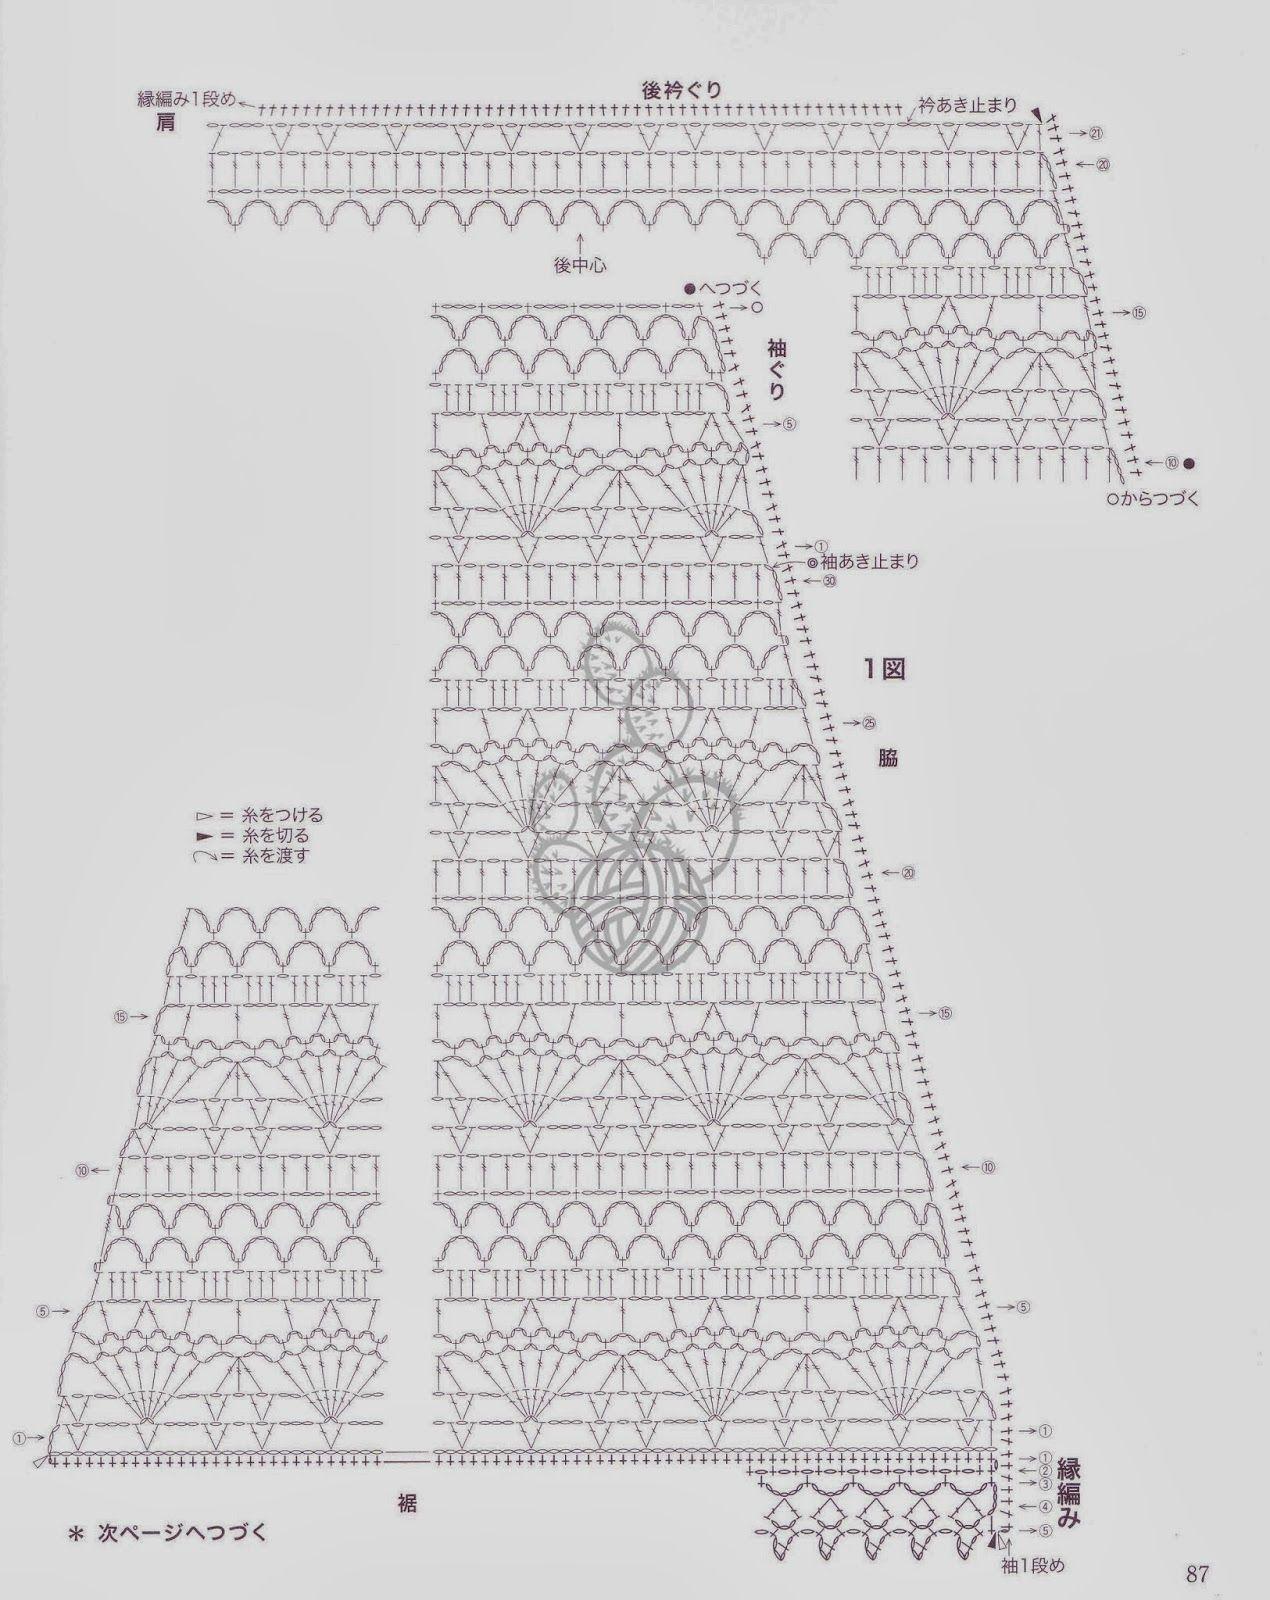 Asombroso Starbella Patrones De Hilo Crochet Regalo - Coser Ideas ...